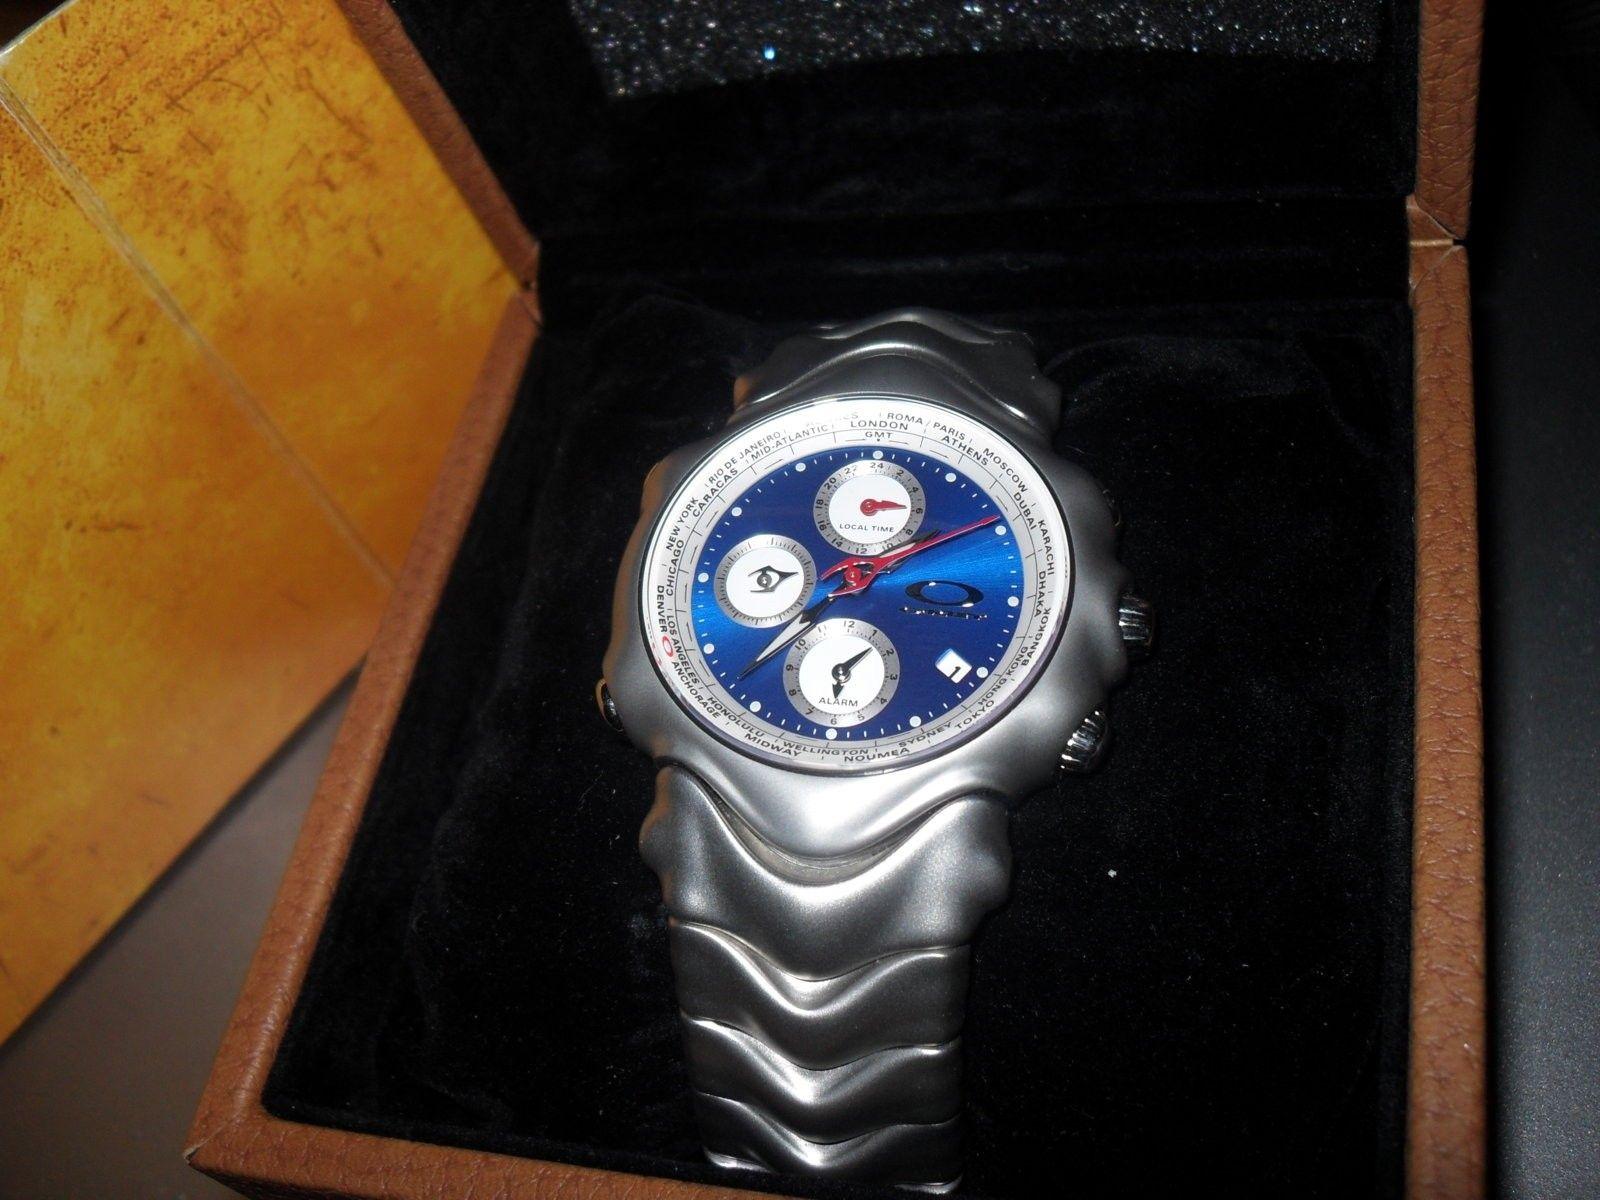 GMT Blue Dial Oakley - SDC10631.JPG